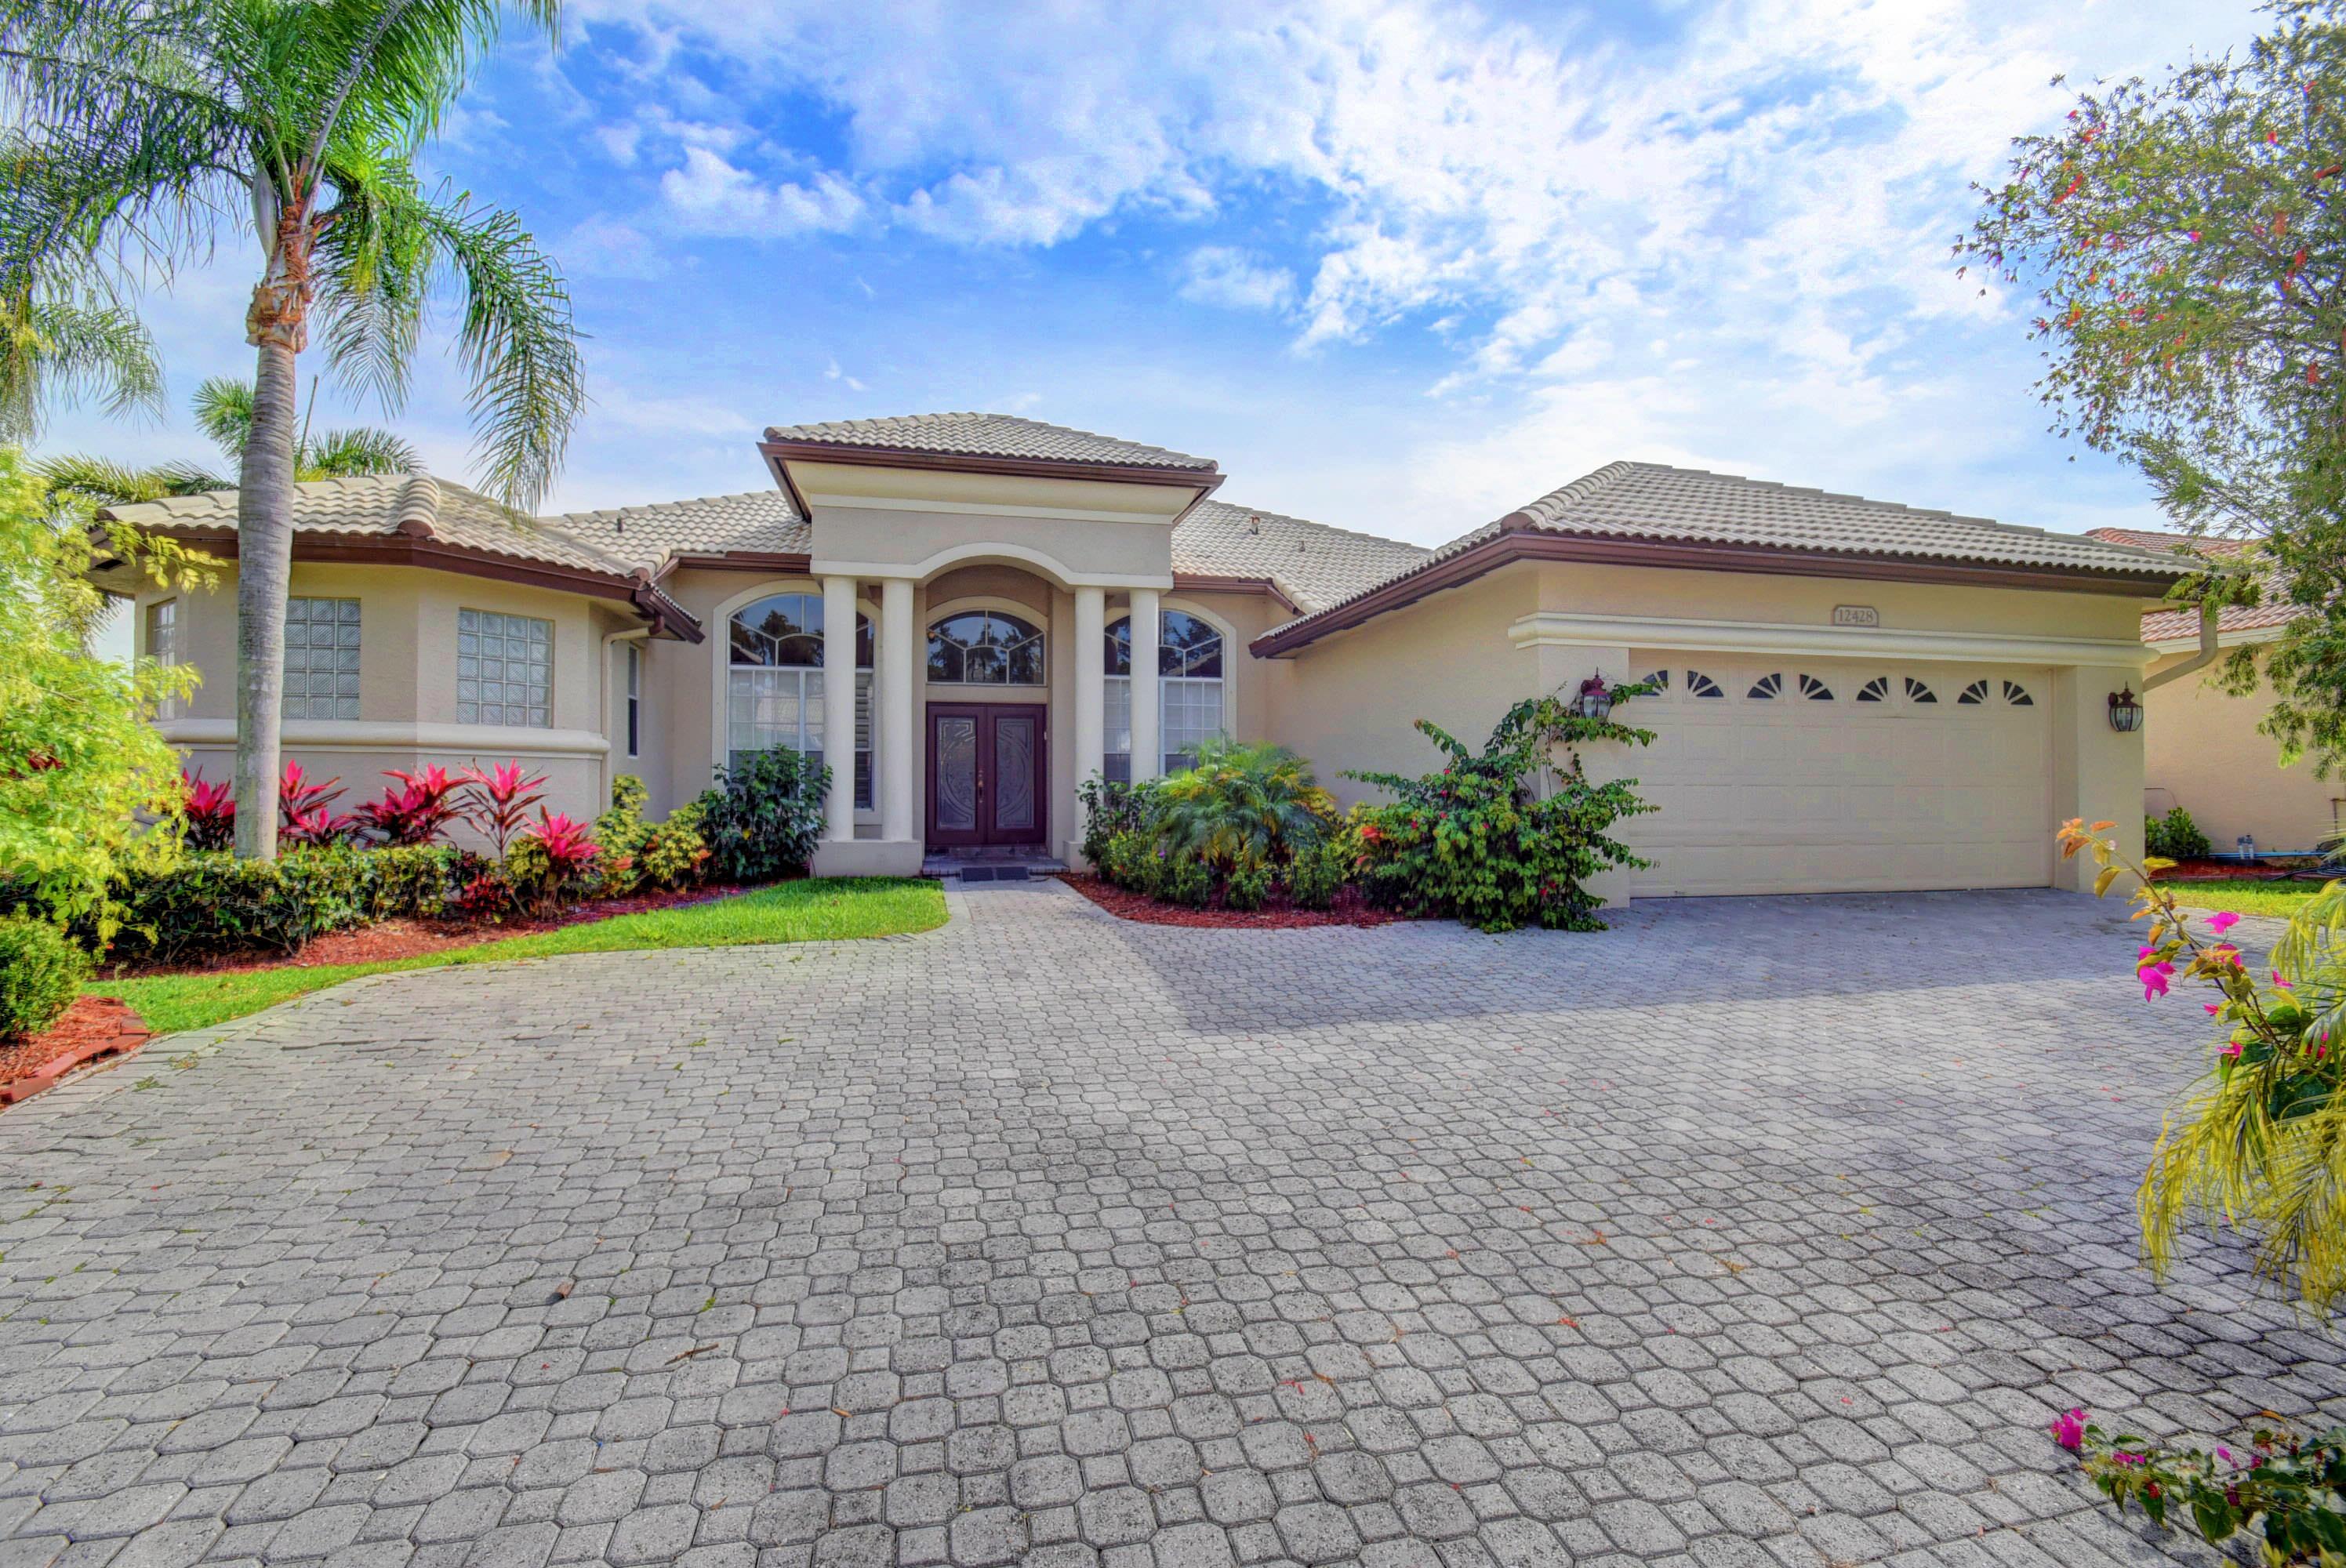 12428 Clearfalls Drive Boca Raton, FL 33428